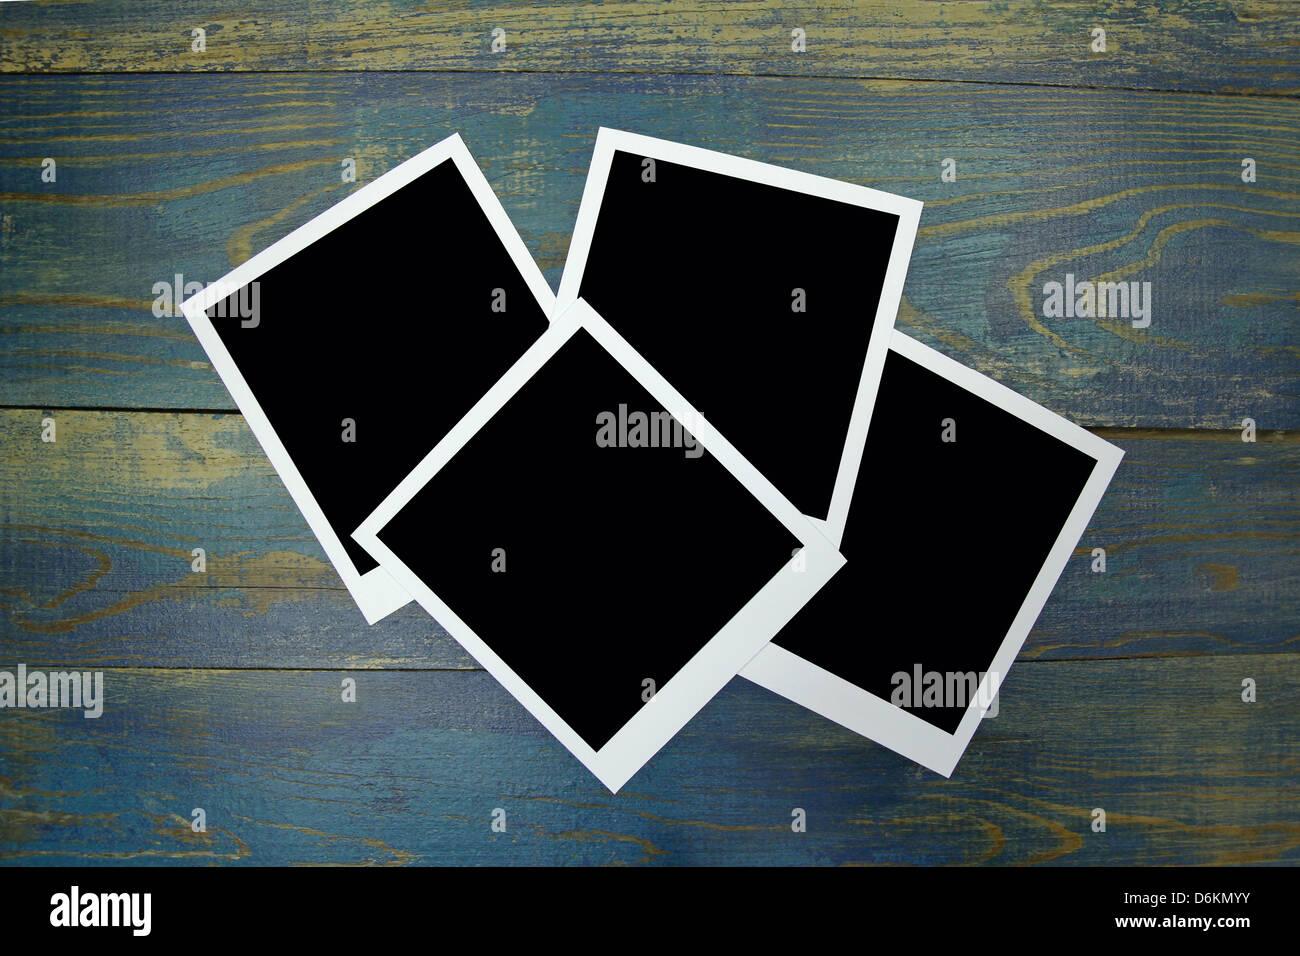 vier digitale Bilderrahmen Stockfoto, Bild: 55752591 - Alamy